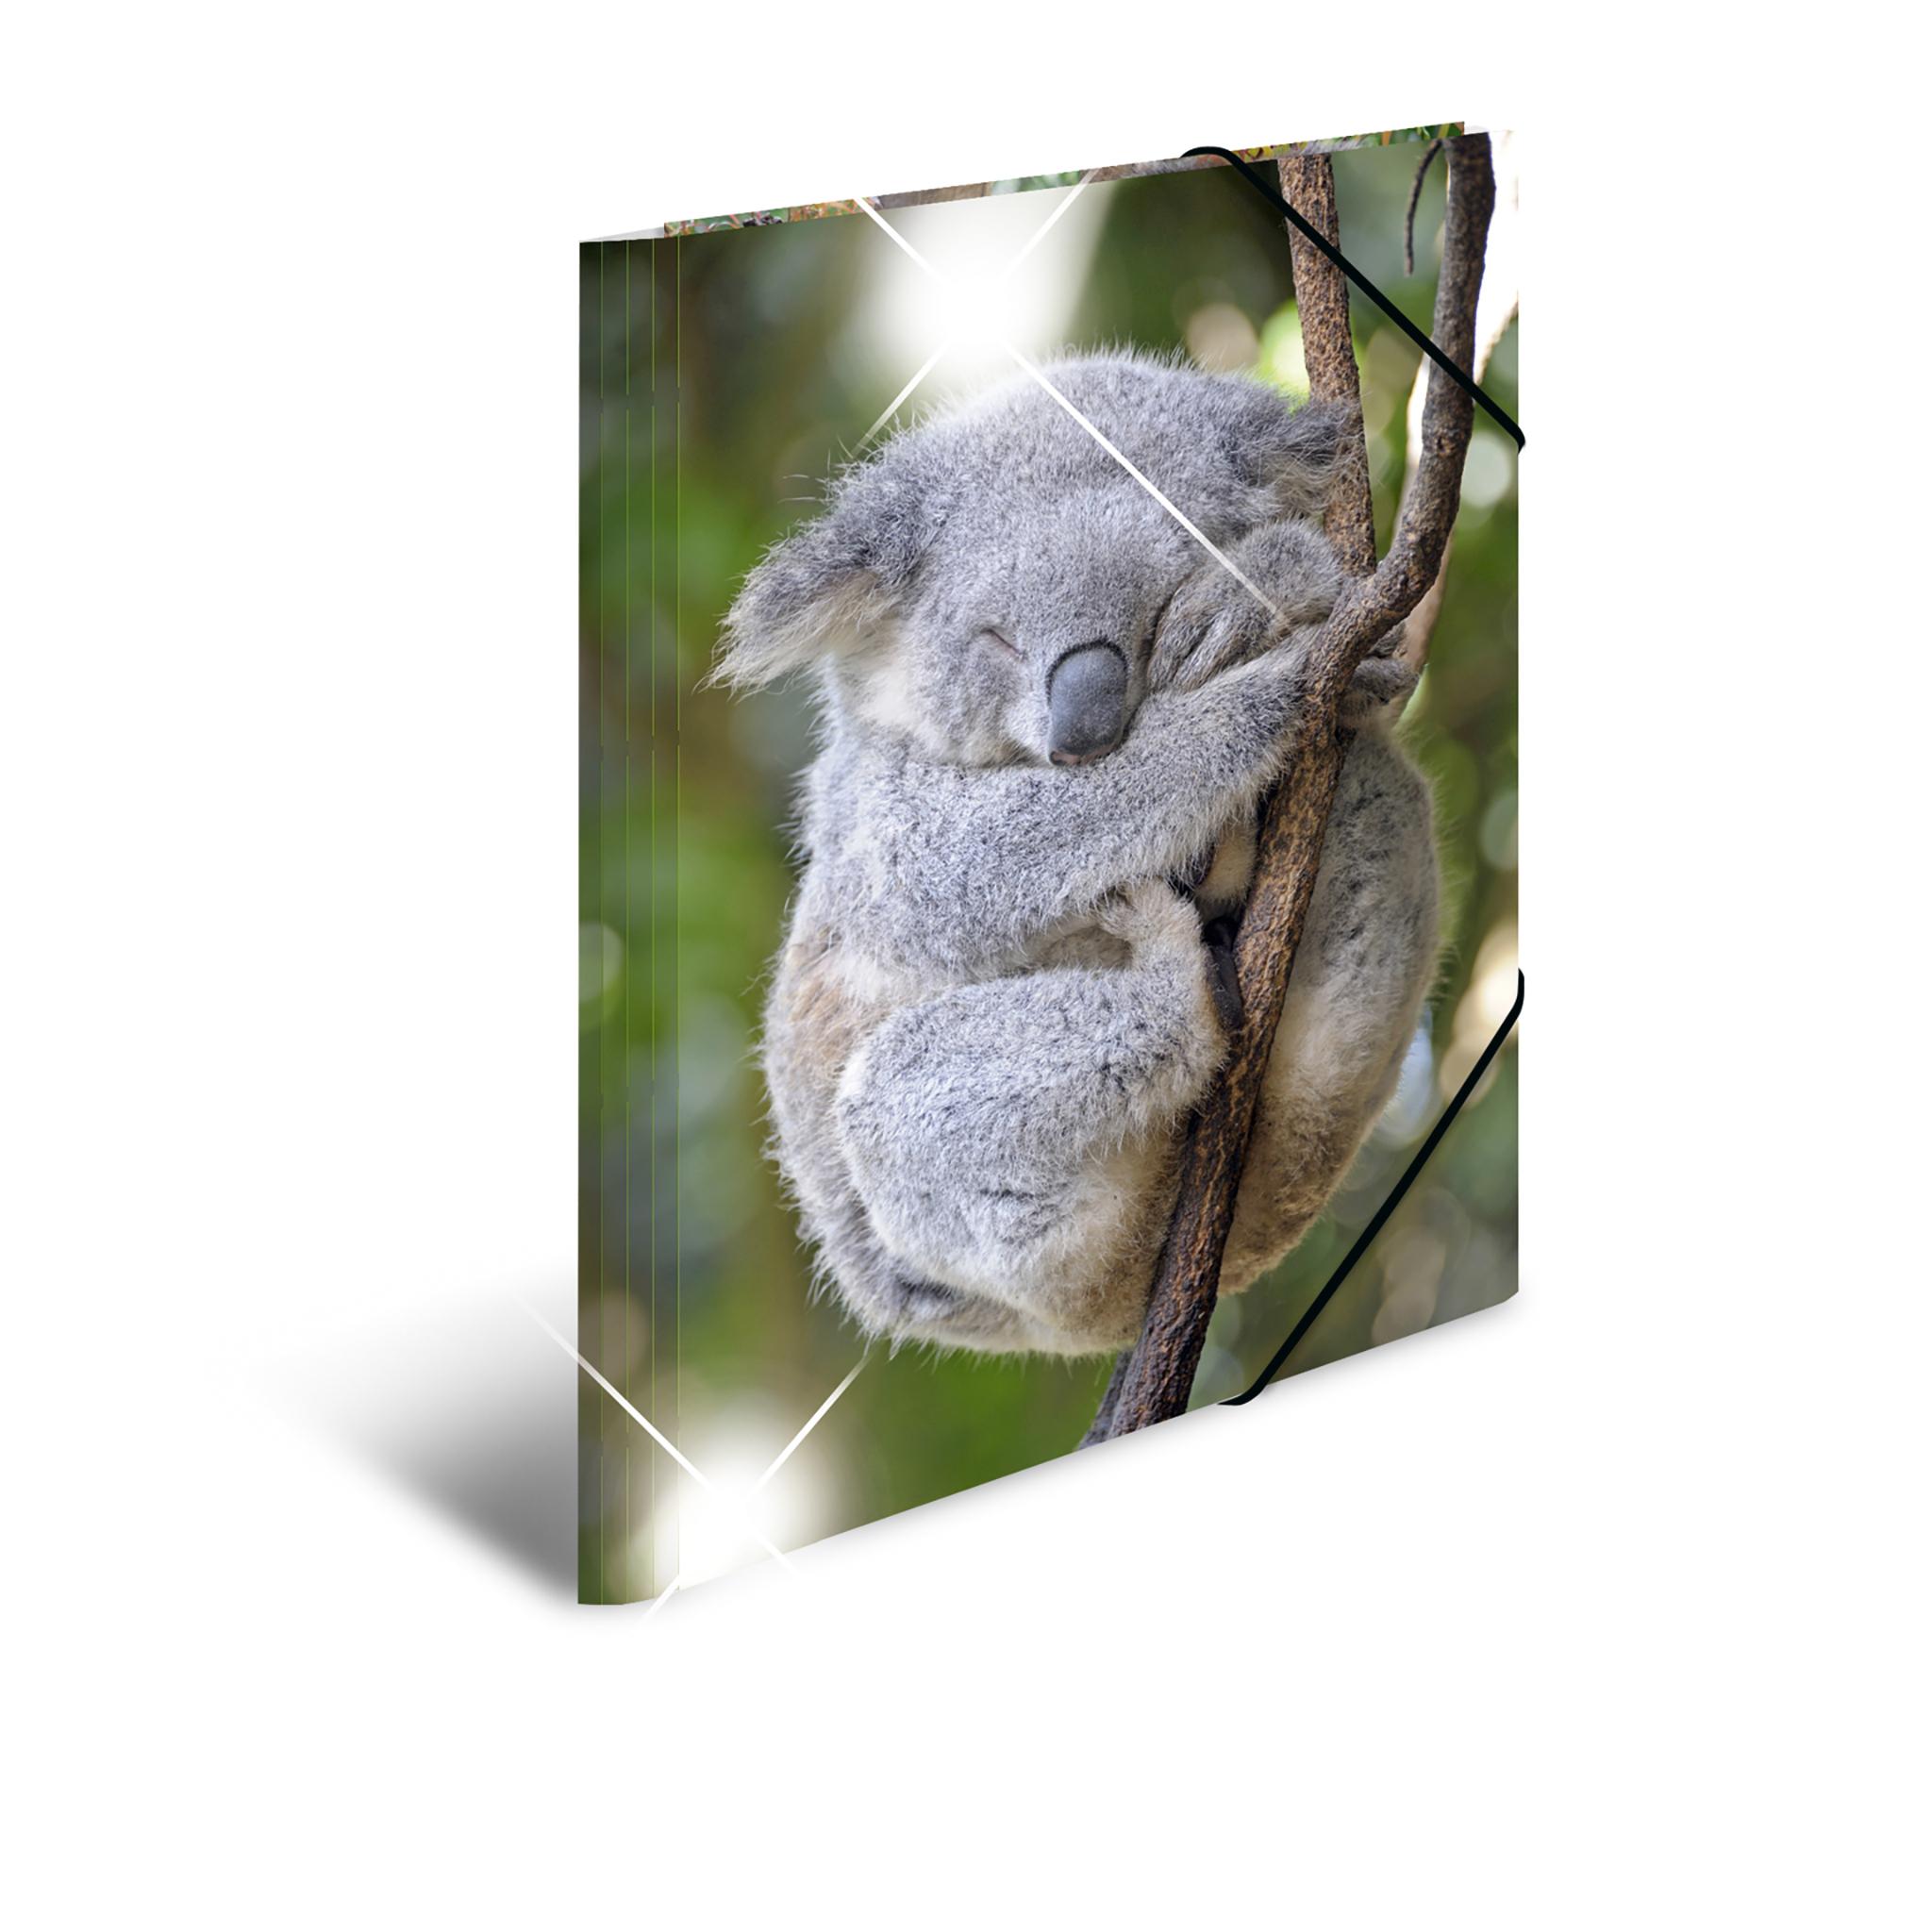 HERMA 19333 - Sammelmappe - Glossy - Tiere - A3 - Polypropylen (PP) - Koala